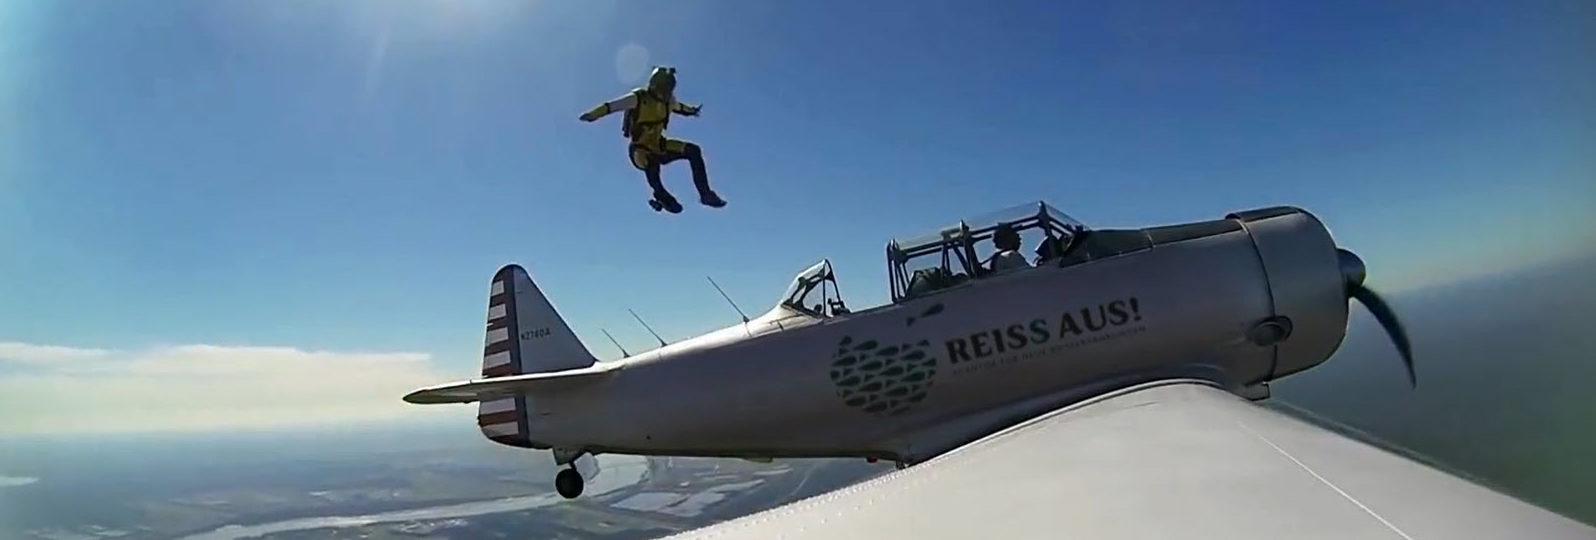 Skydiving mit REISS AUS